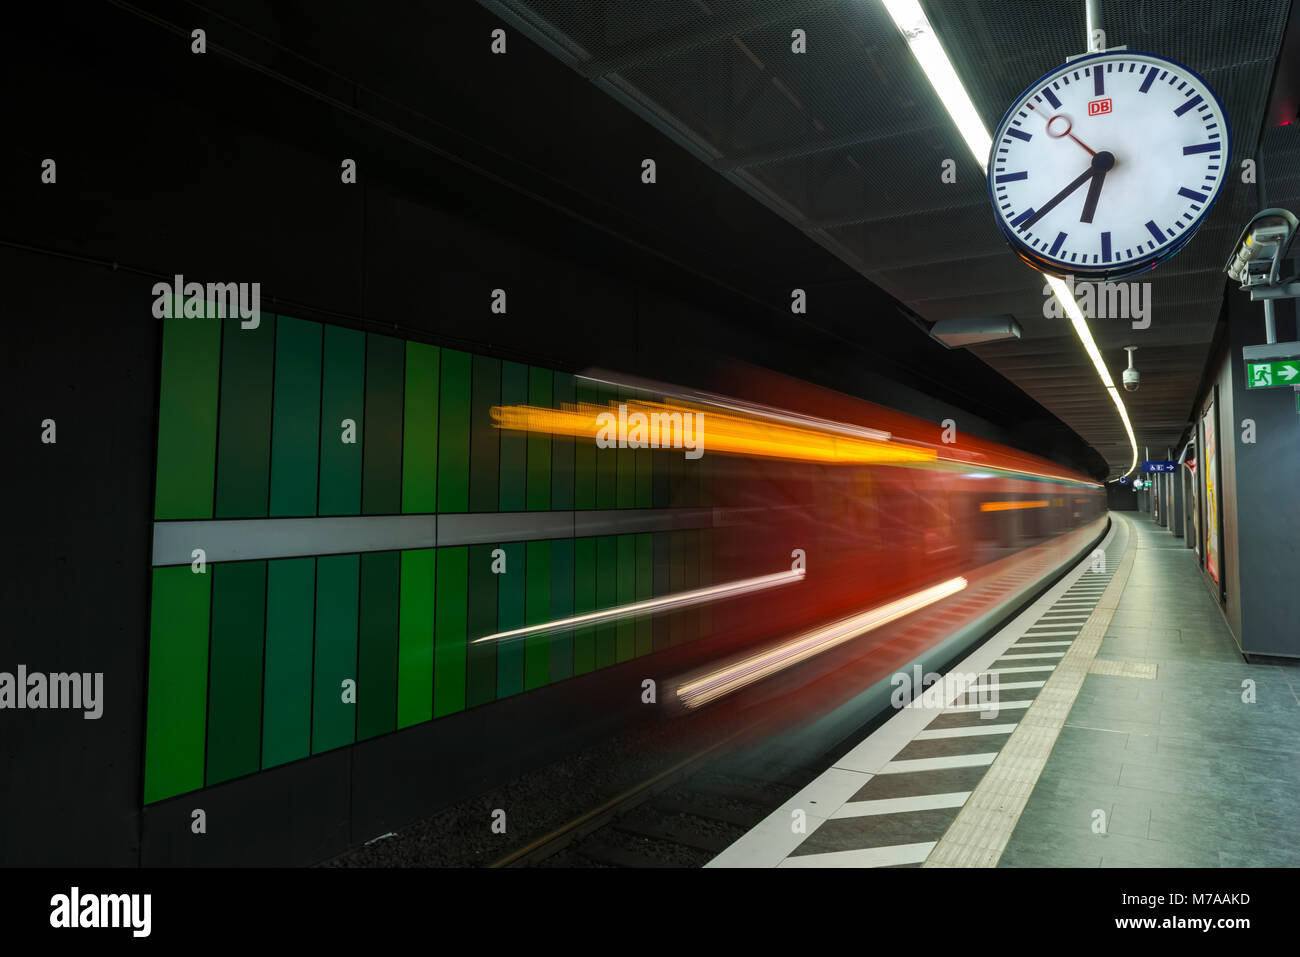 Train coming in at the platform, metropolitan station Taunusanlage, Westend, Frankfurt am Main, Hesse, Germany - Stock Image